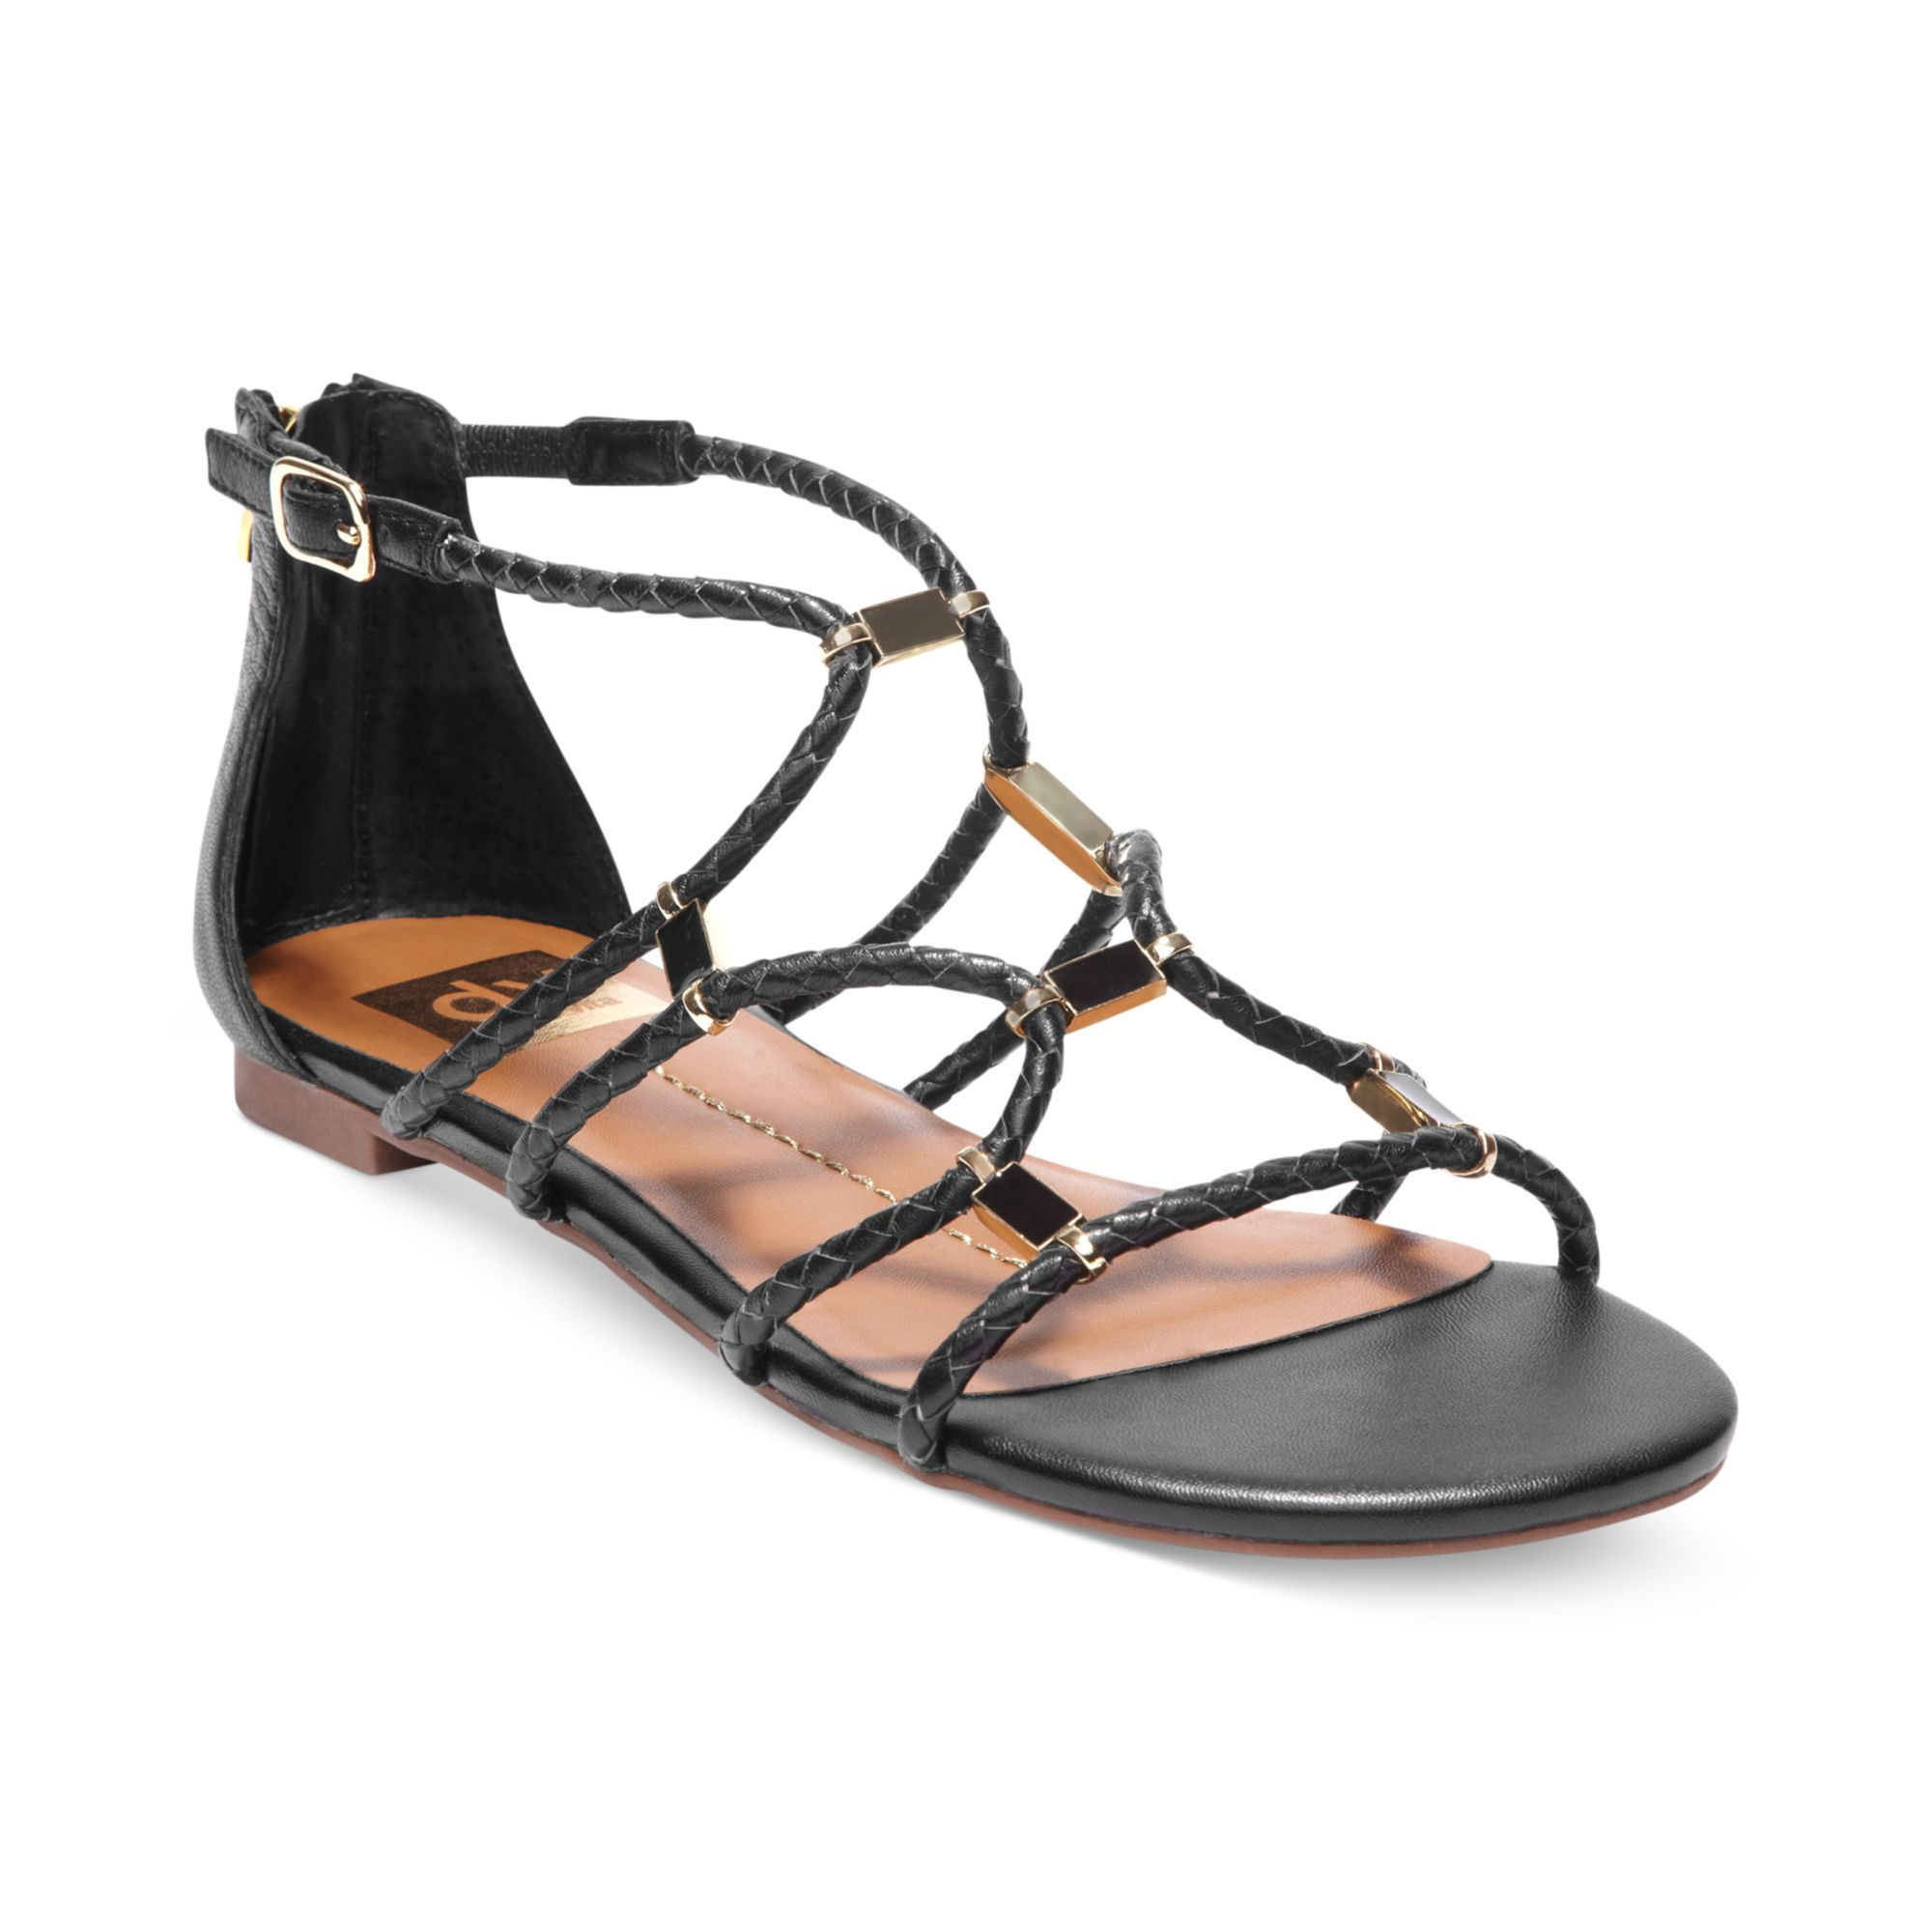 94aba238e2e42a Lyst - Dolce Vita Dv By Agate Strappy Flat Sandals in Black